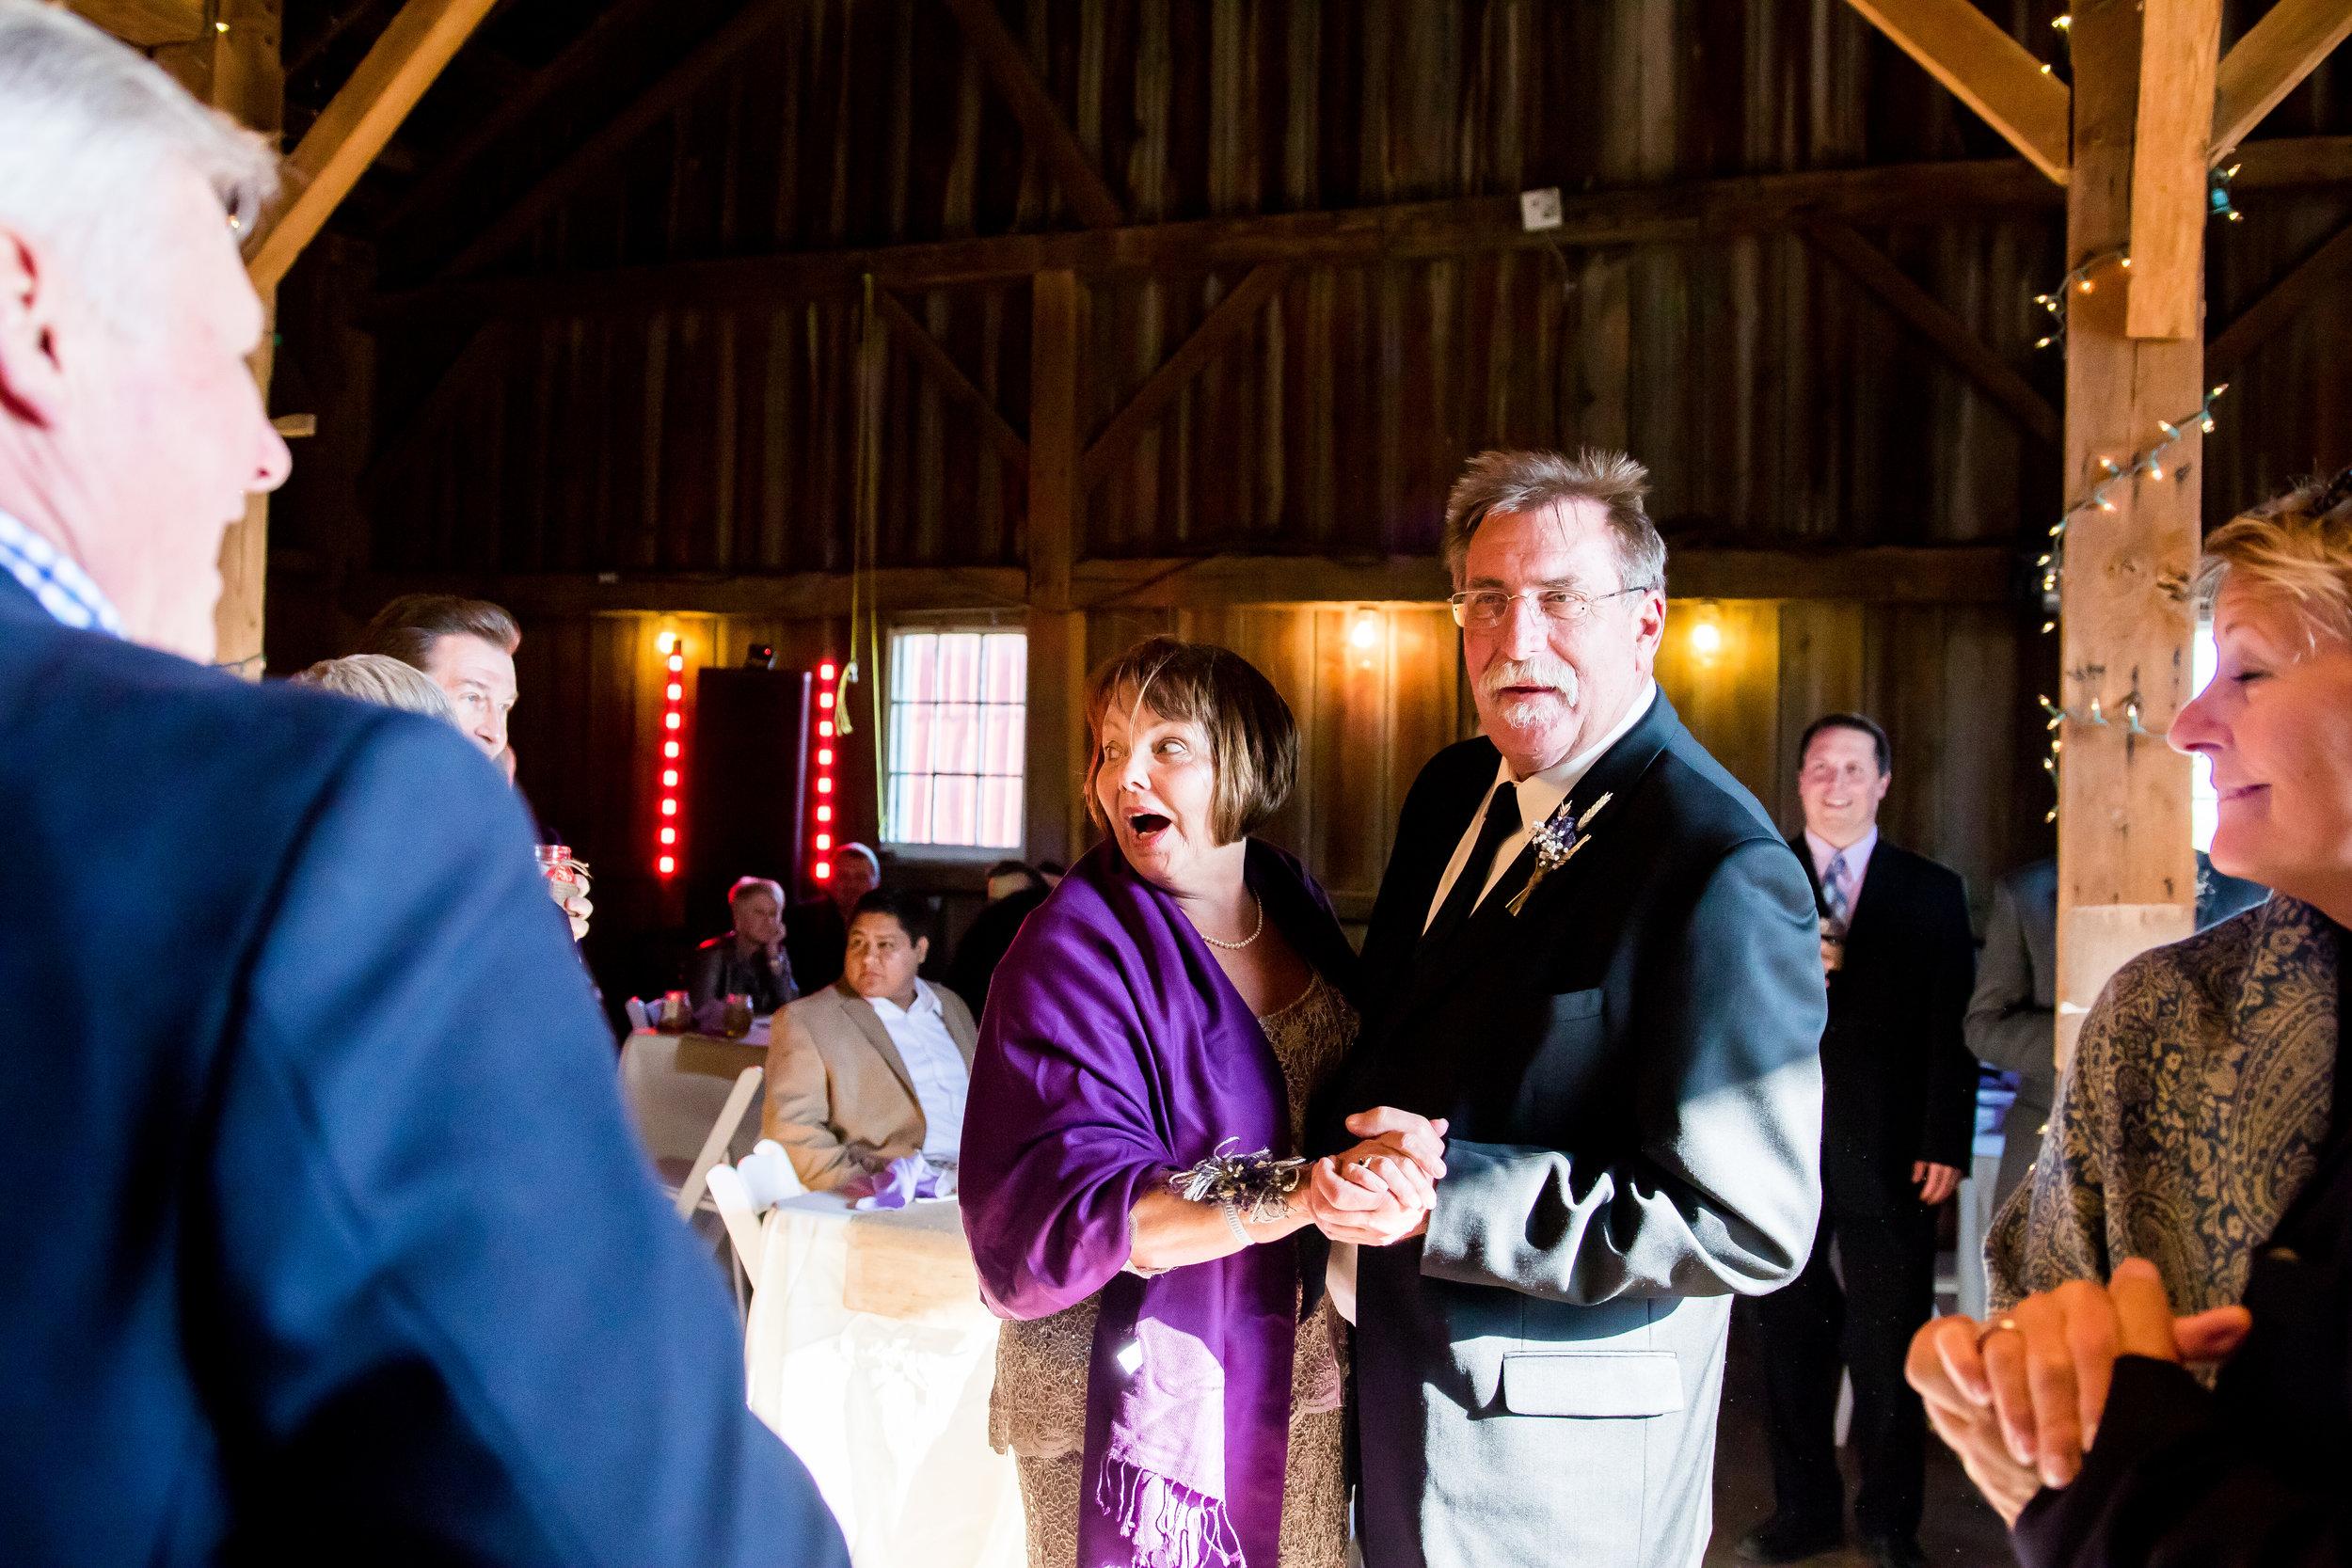 Indiana_Wedding_Photography_Zacharaiah-967.jpg